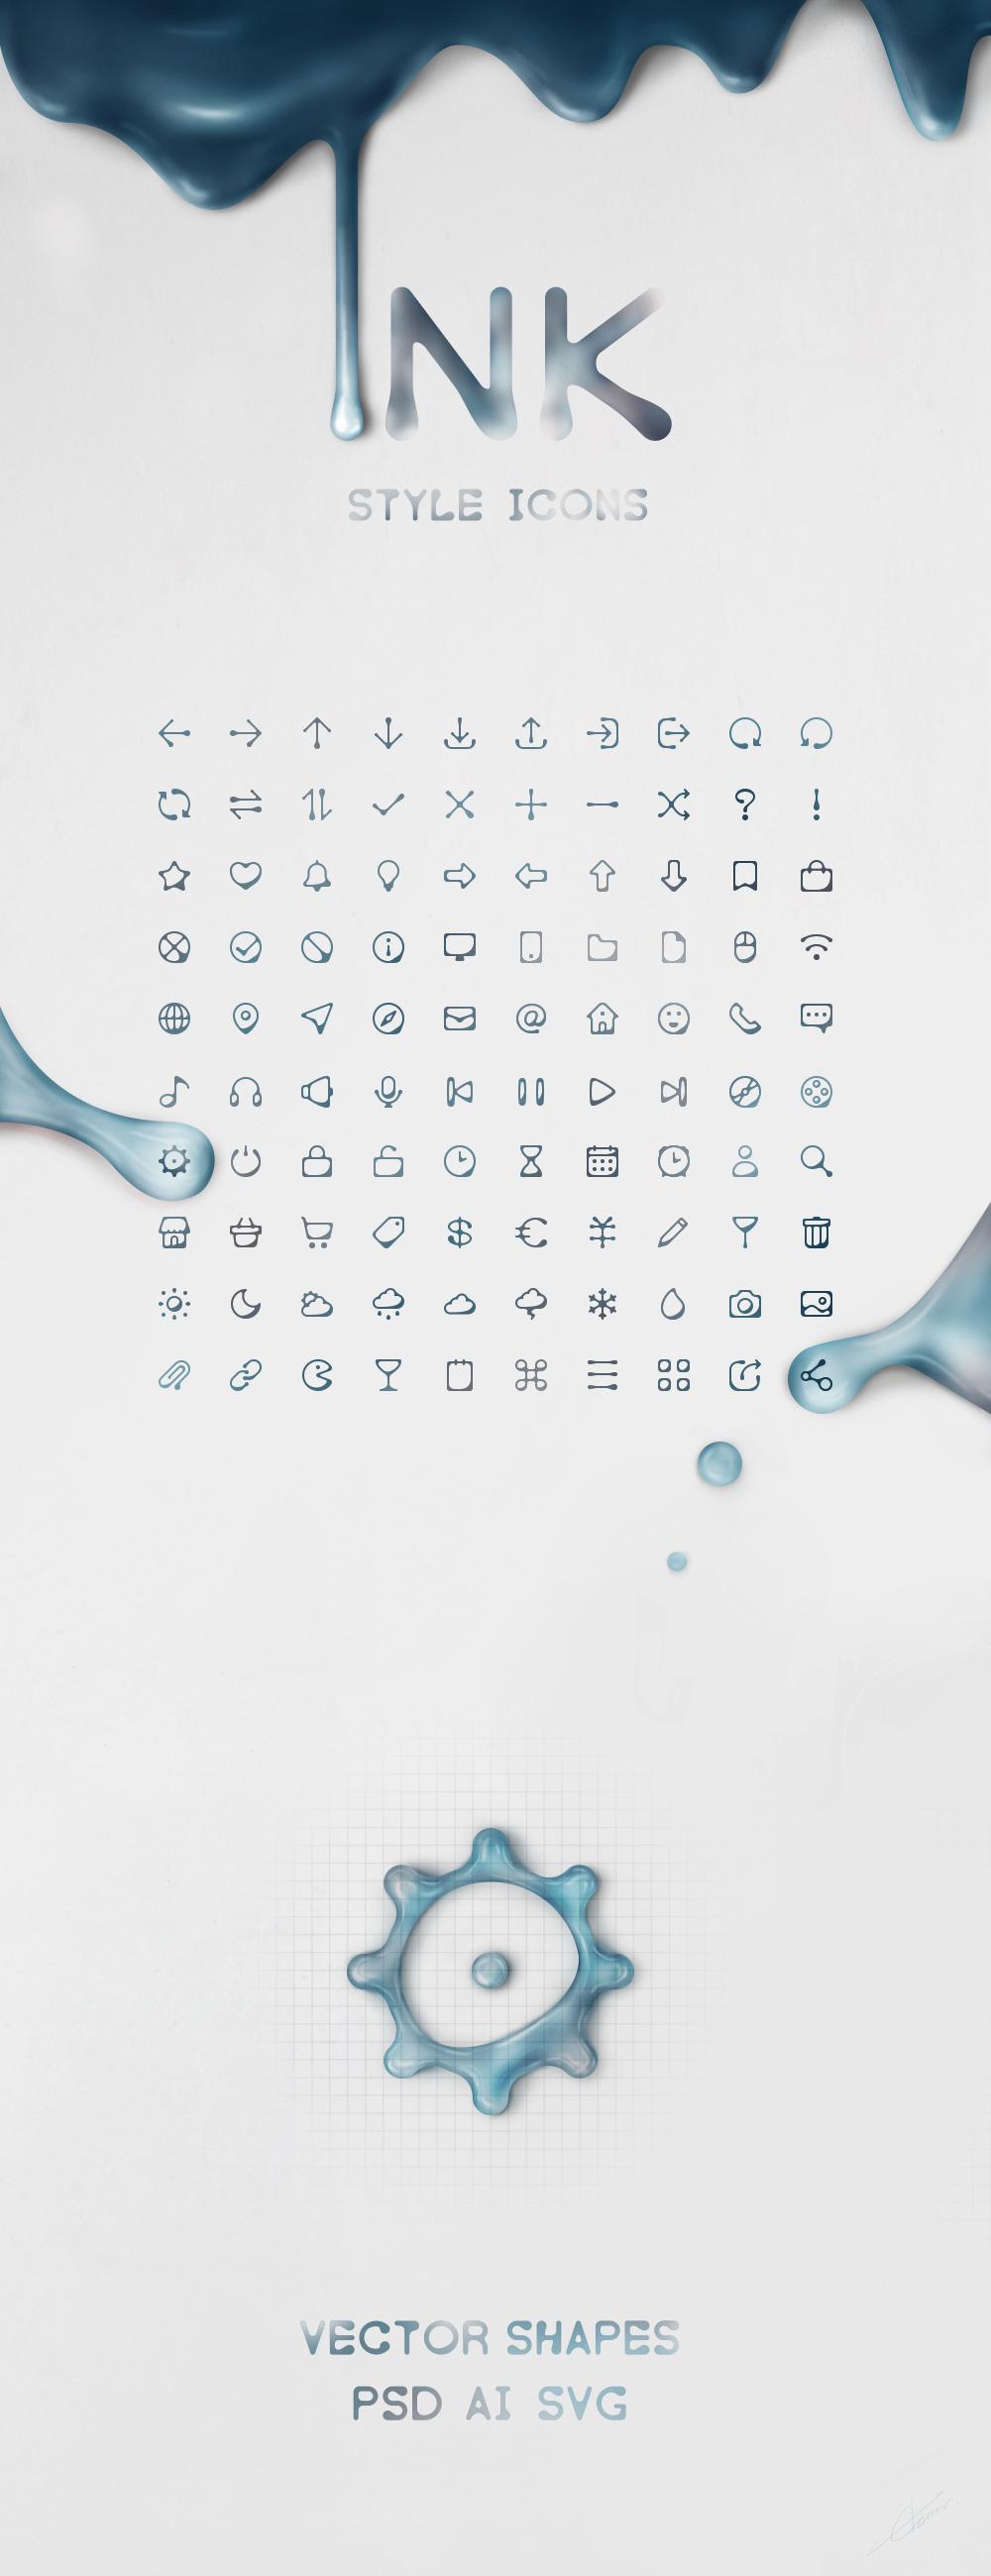 Icon,graphic,design,UI,Liquid,ink,drop,vector,shape,free,download,svg,ai,psd